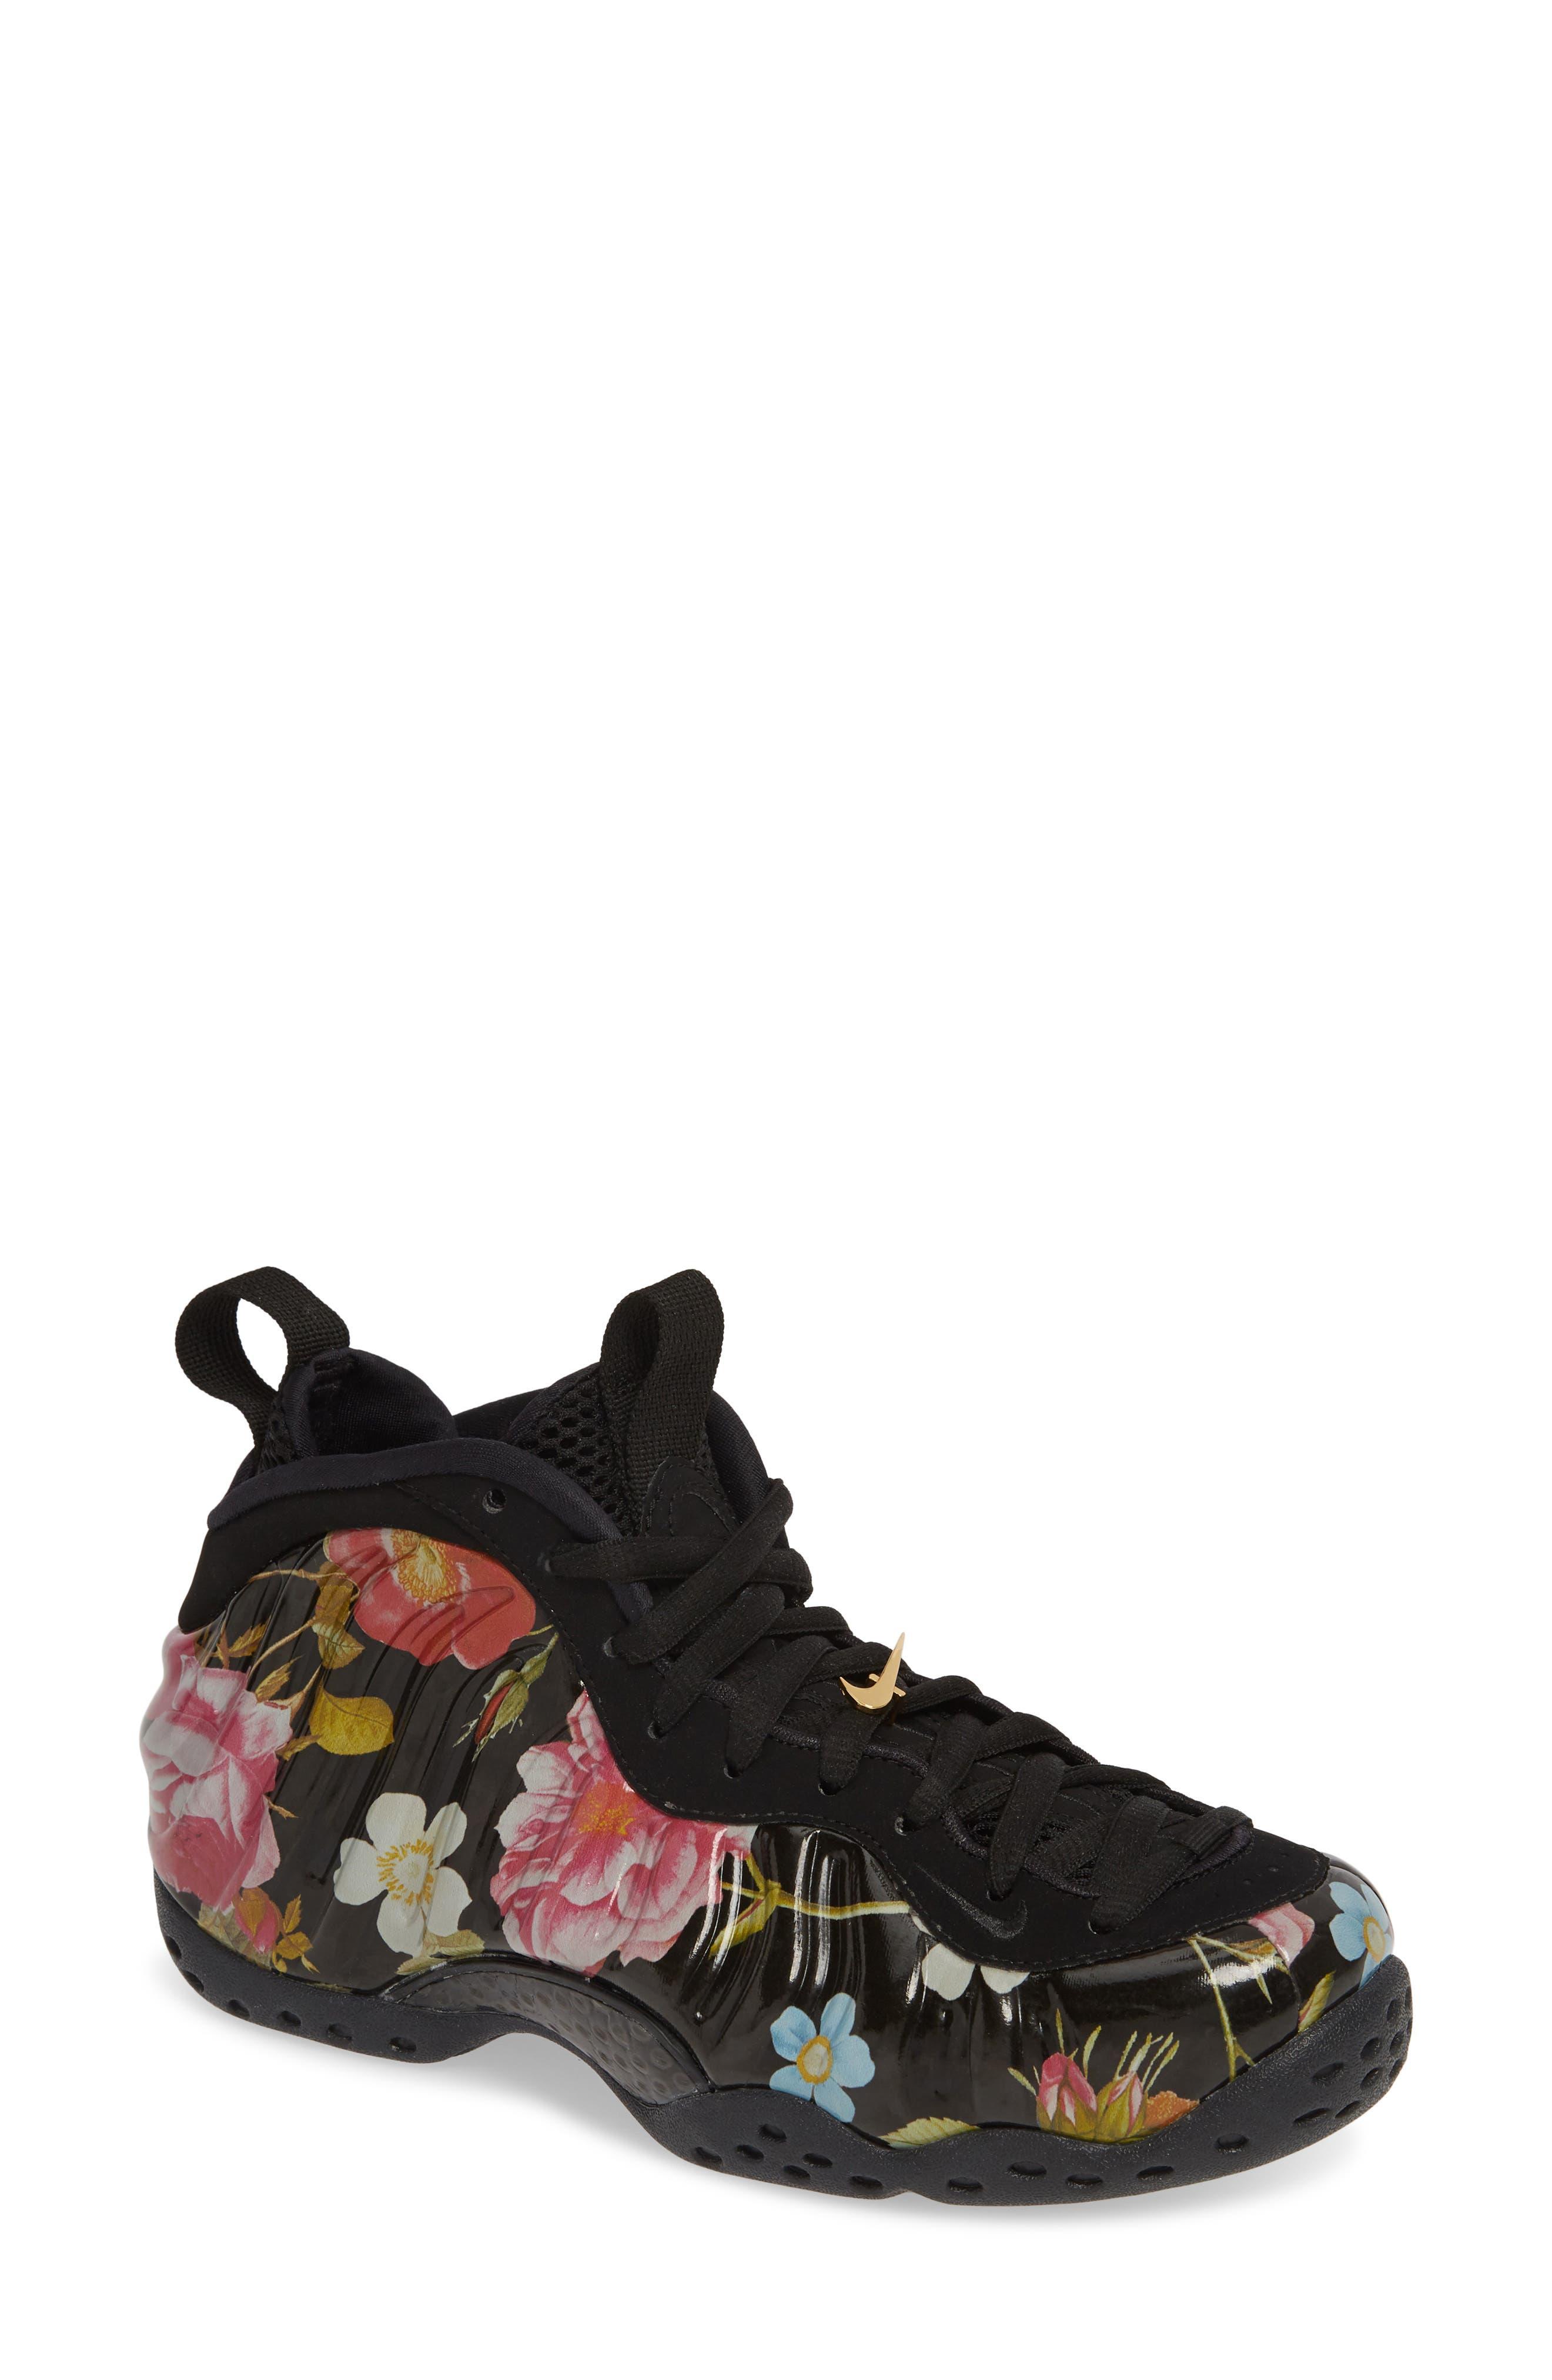 NIKE Air Foamposite One Sneaker, Main, color, BLACK/ BLACK-METALLIC GOLD